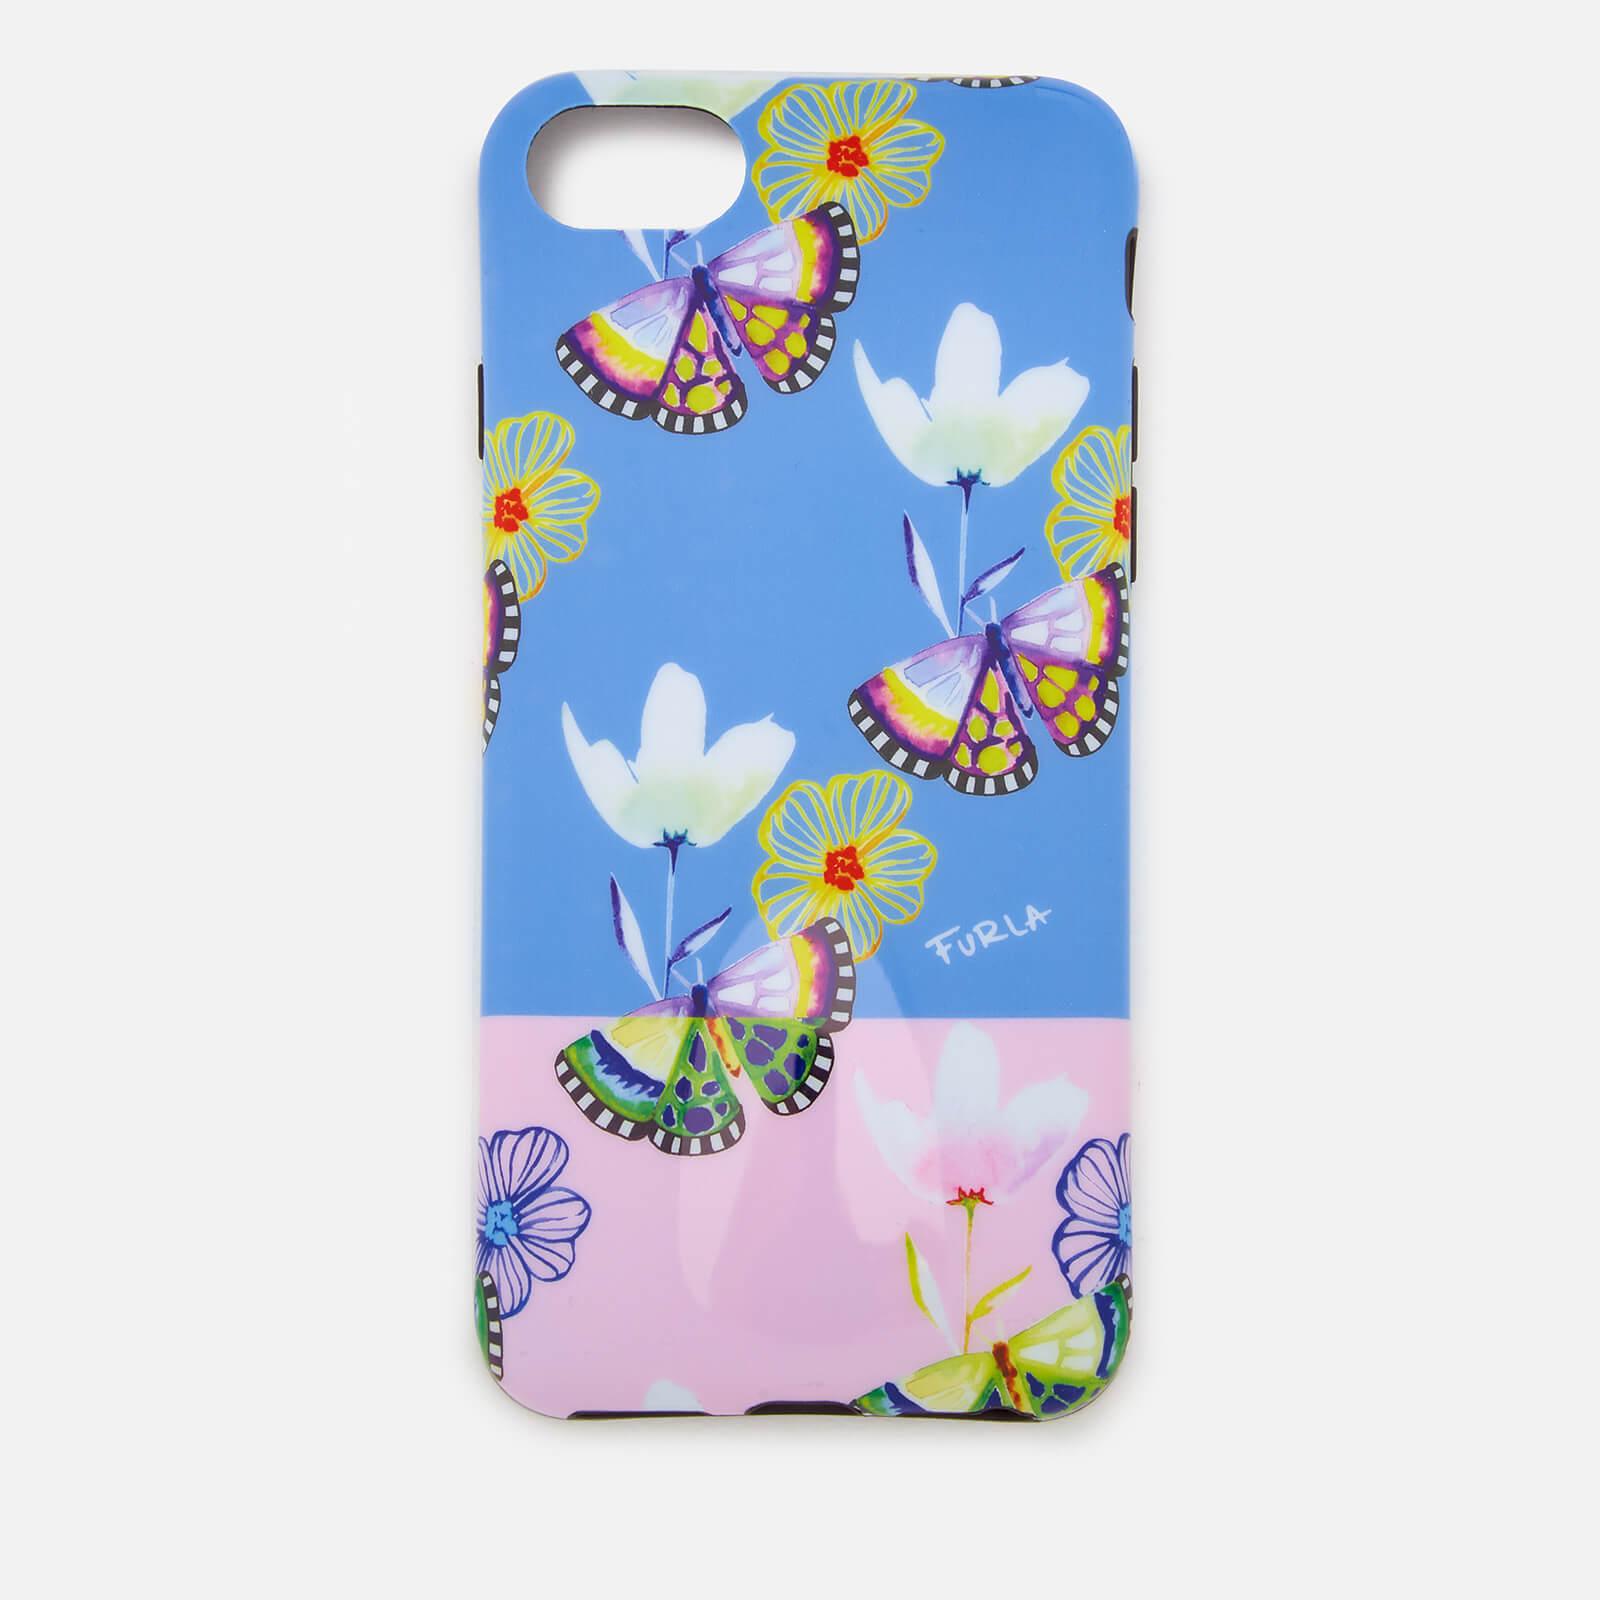 Furla Women's High Tech iPhone 6/7/8 Case - Multi